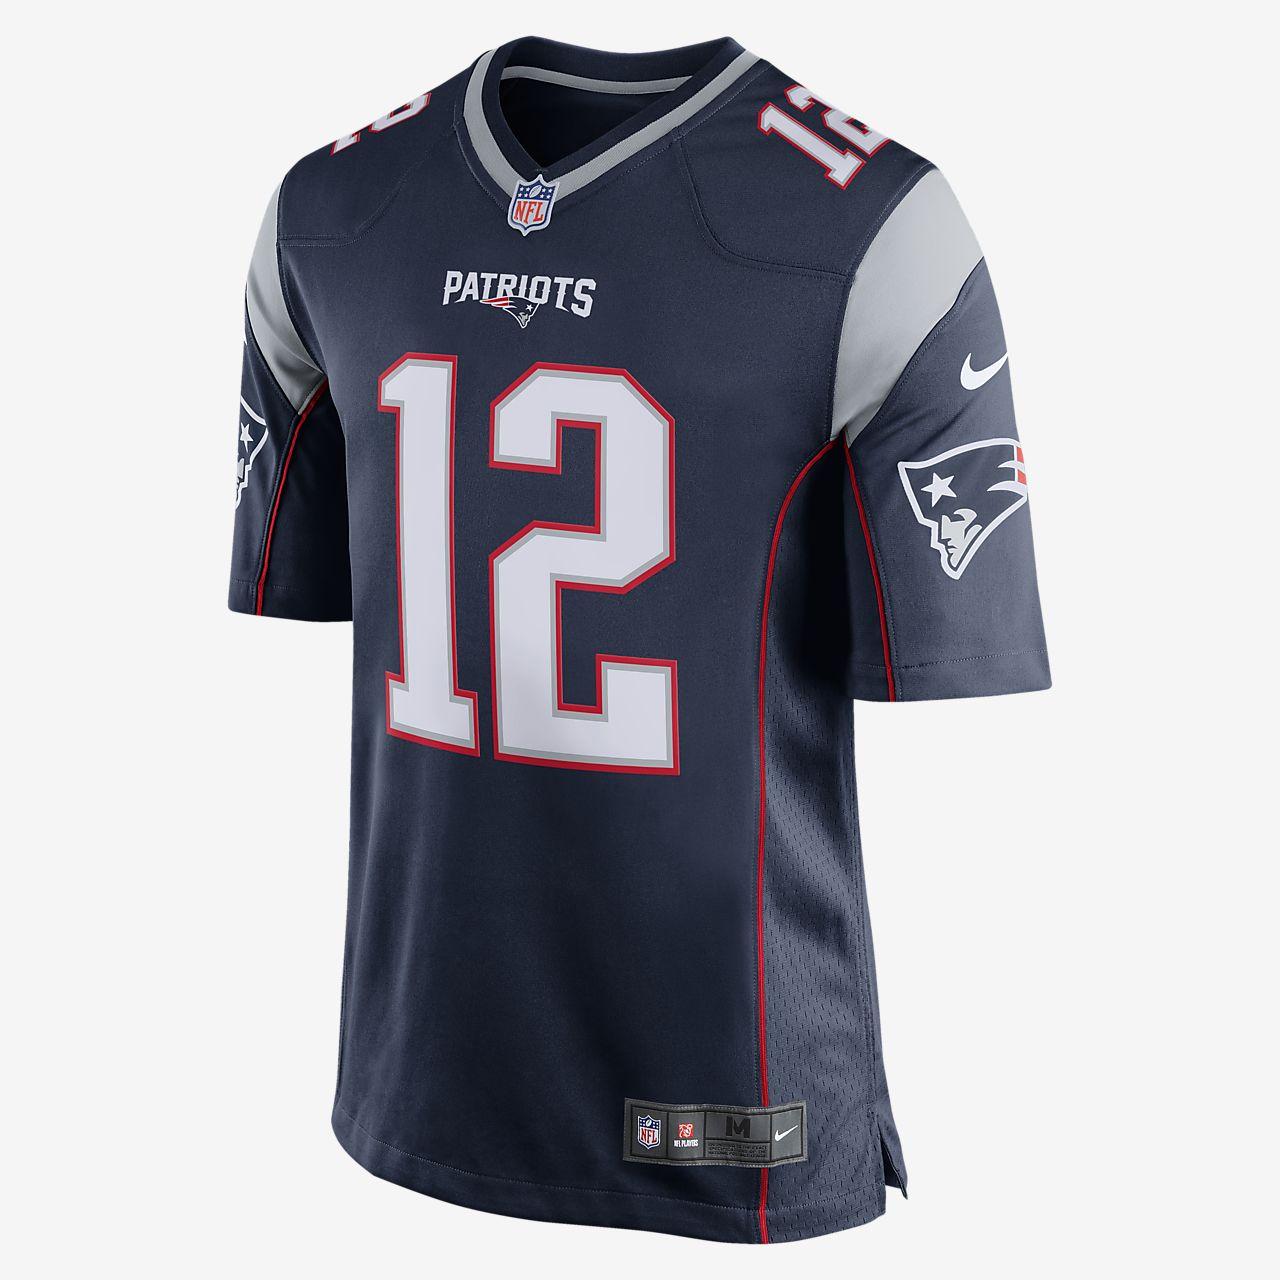 Pánský fotbalový dres pro domácí zápasy NFL New England Patriots (Tom Brady)